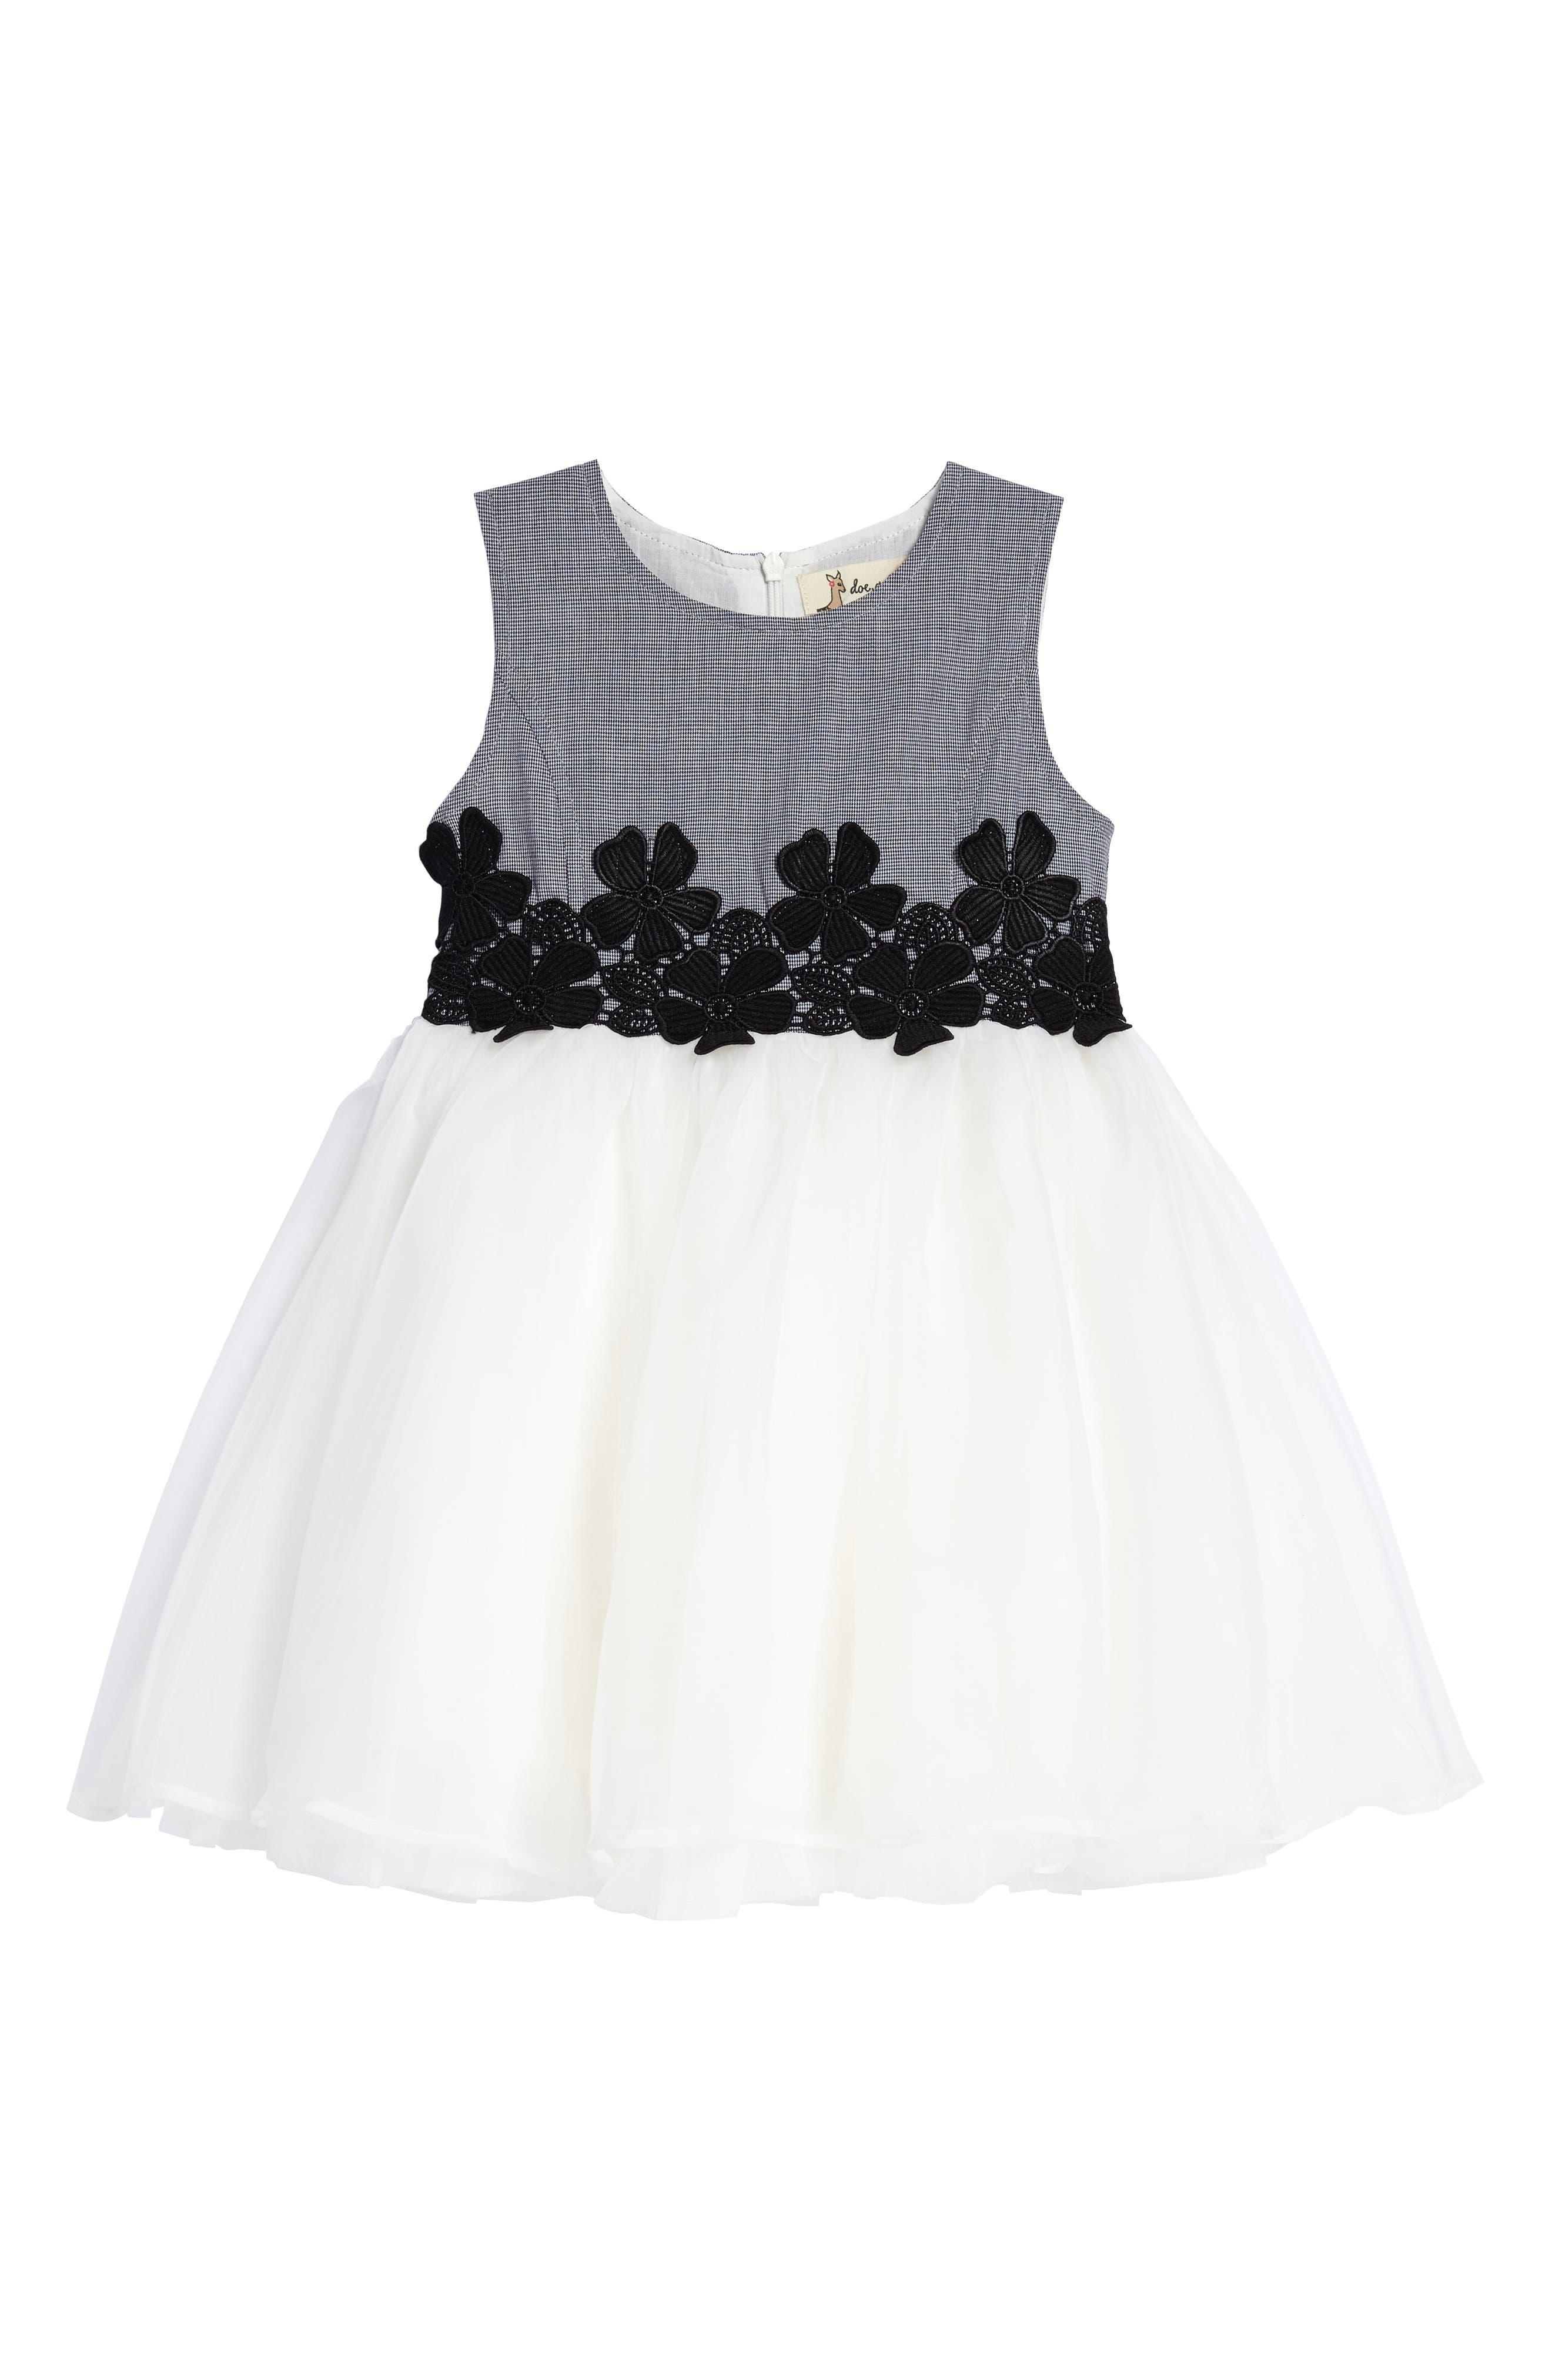 Mini Houndstooth & Tulle Dress,                             Main thumbnail 1, color,                             Black/ White